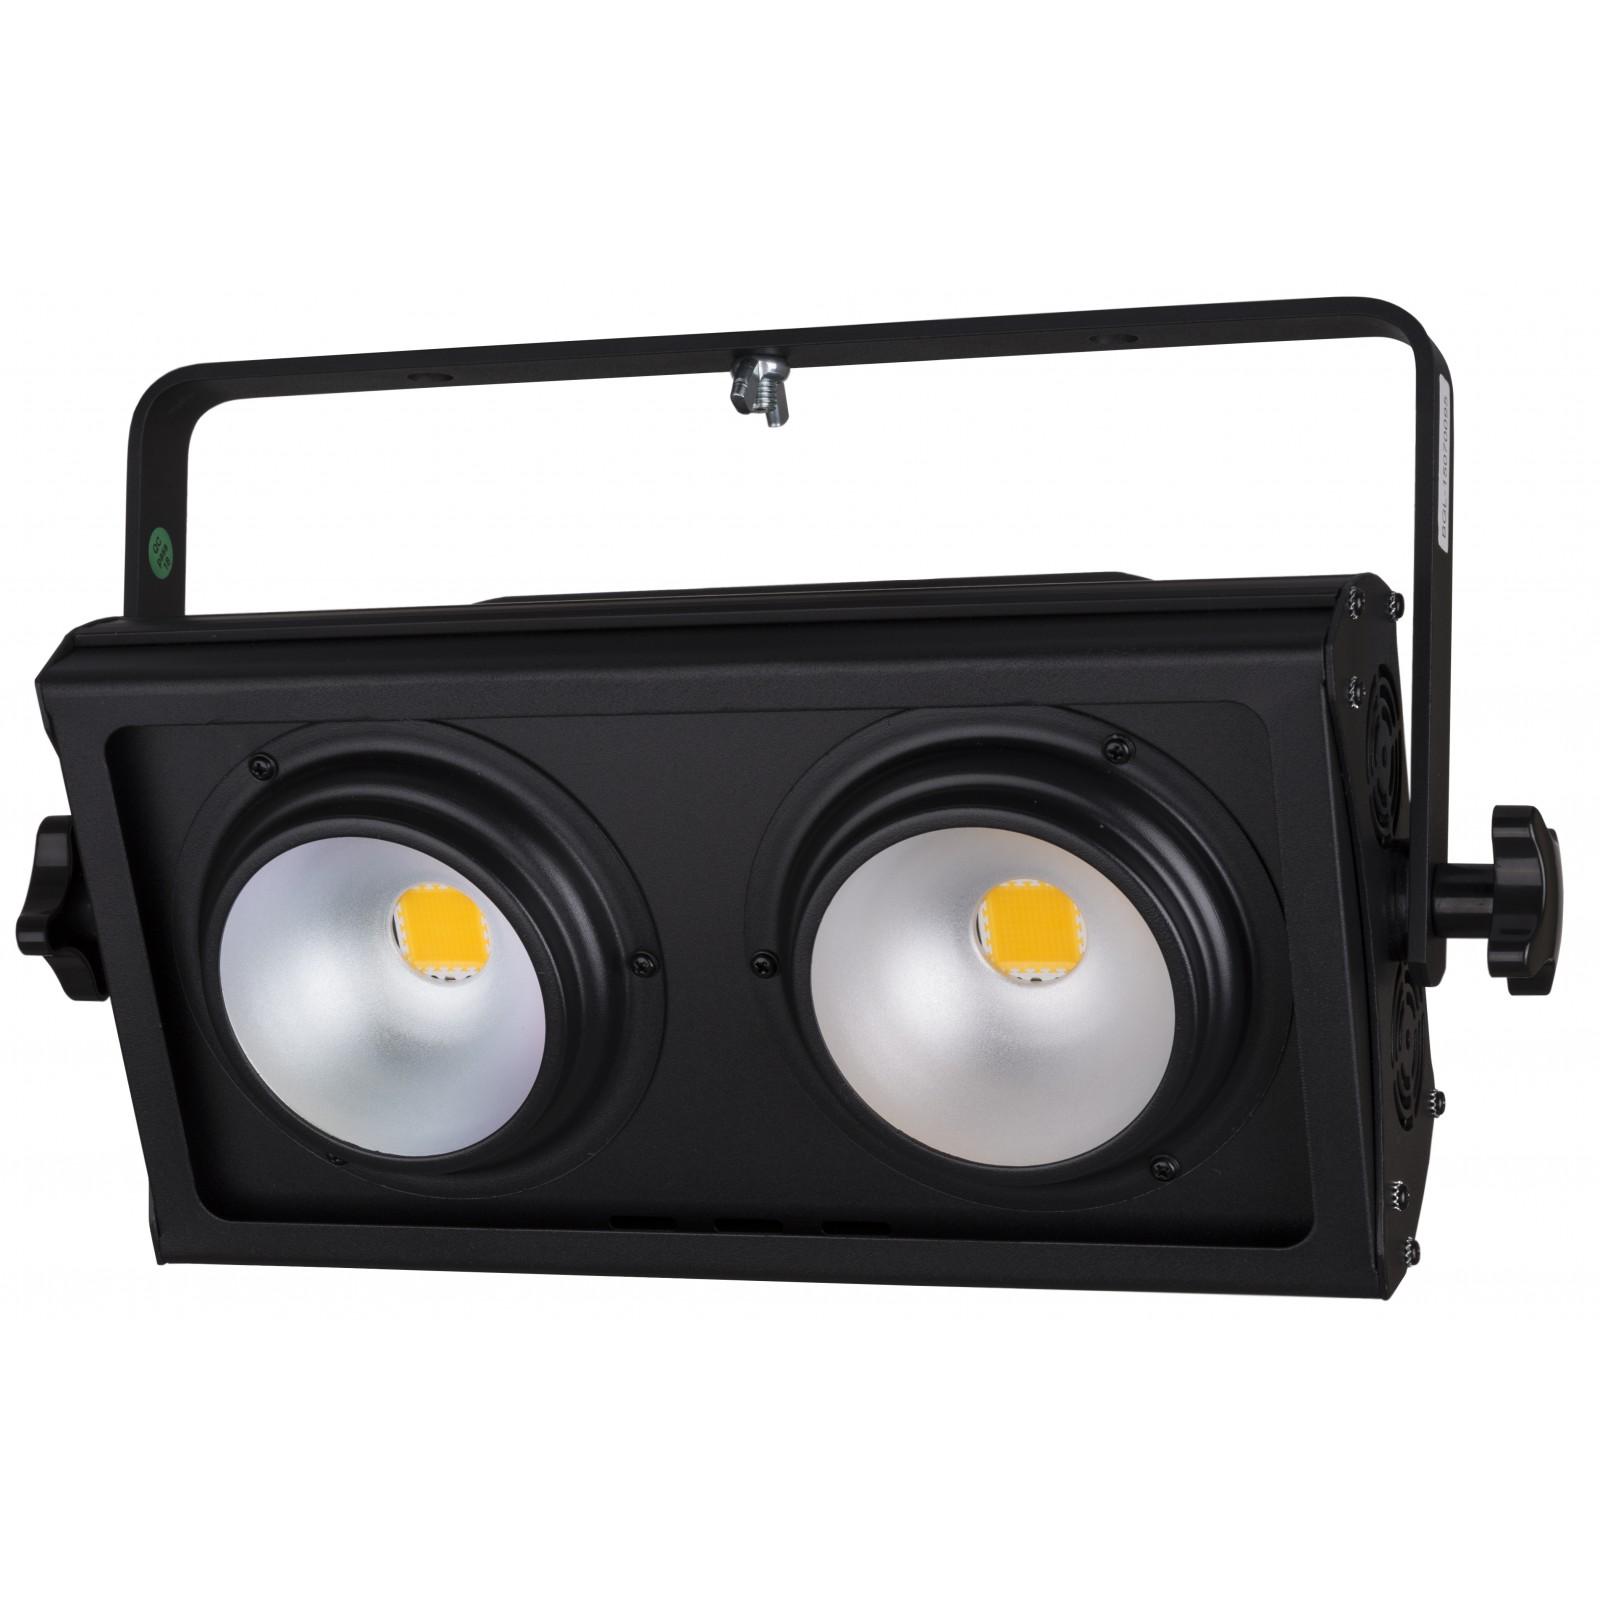 Briteq Cob Blinder 2x100w Strobe Light Effects